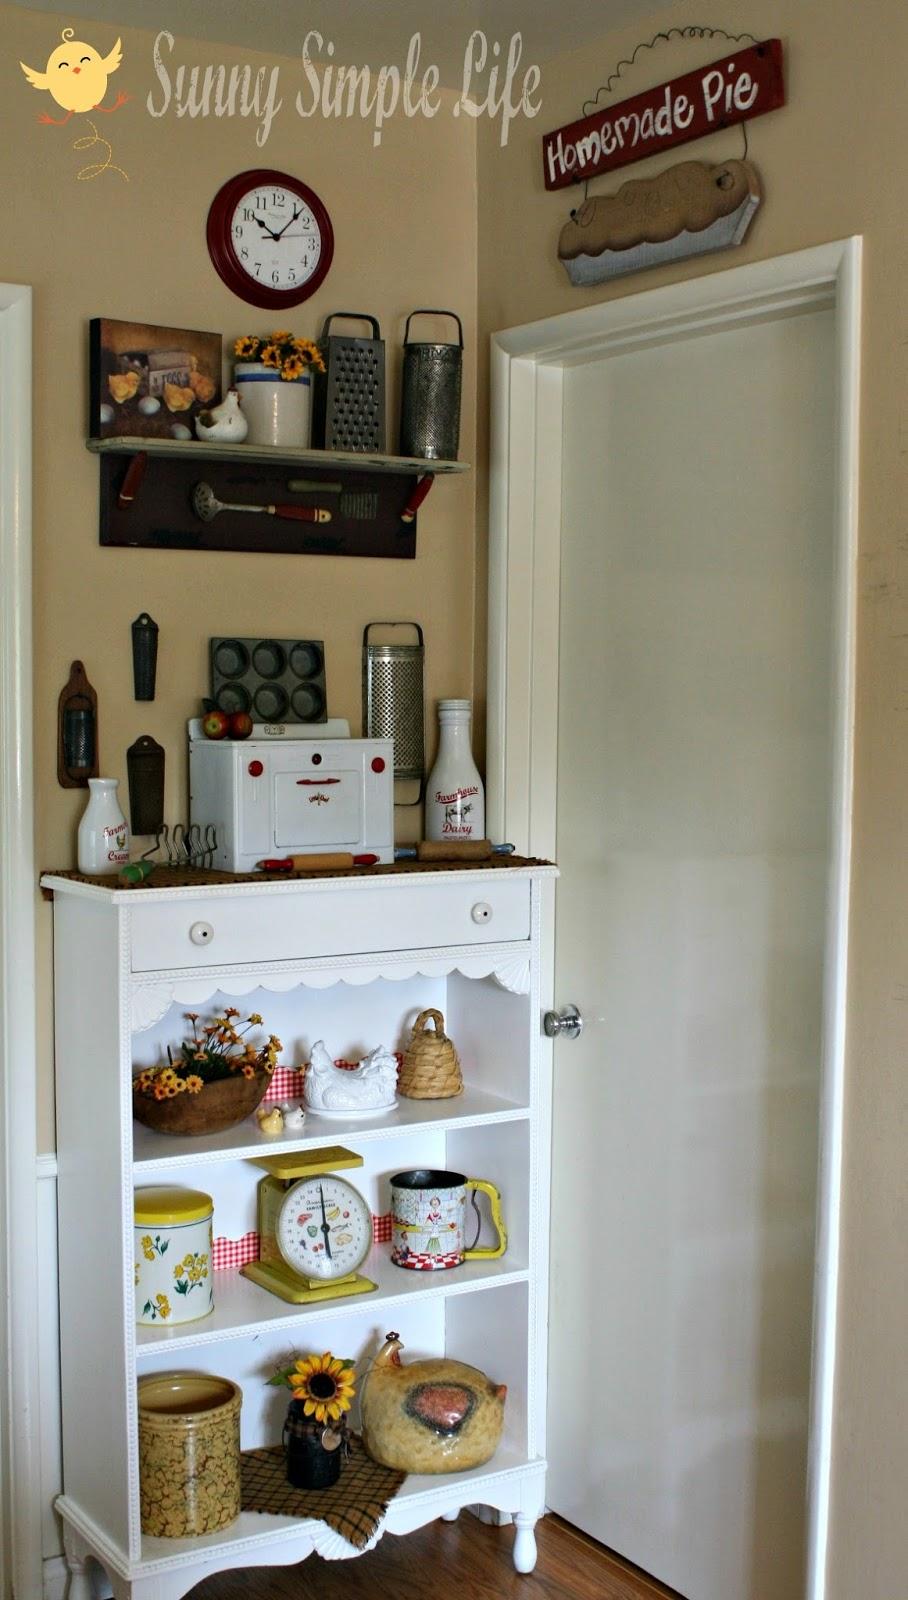 sunny simple life farmhouse kitchen love